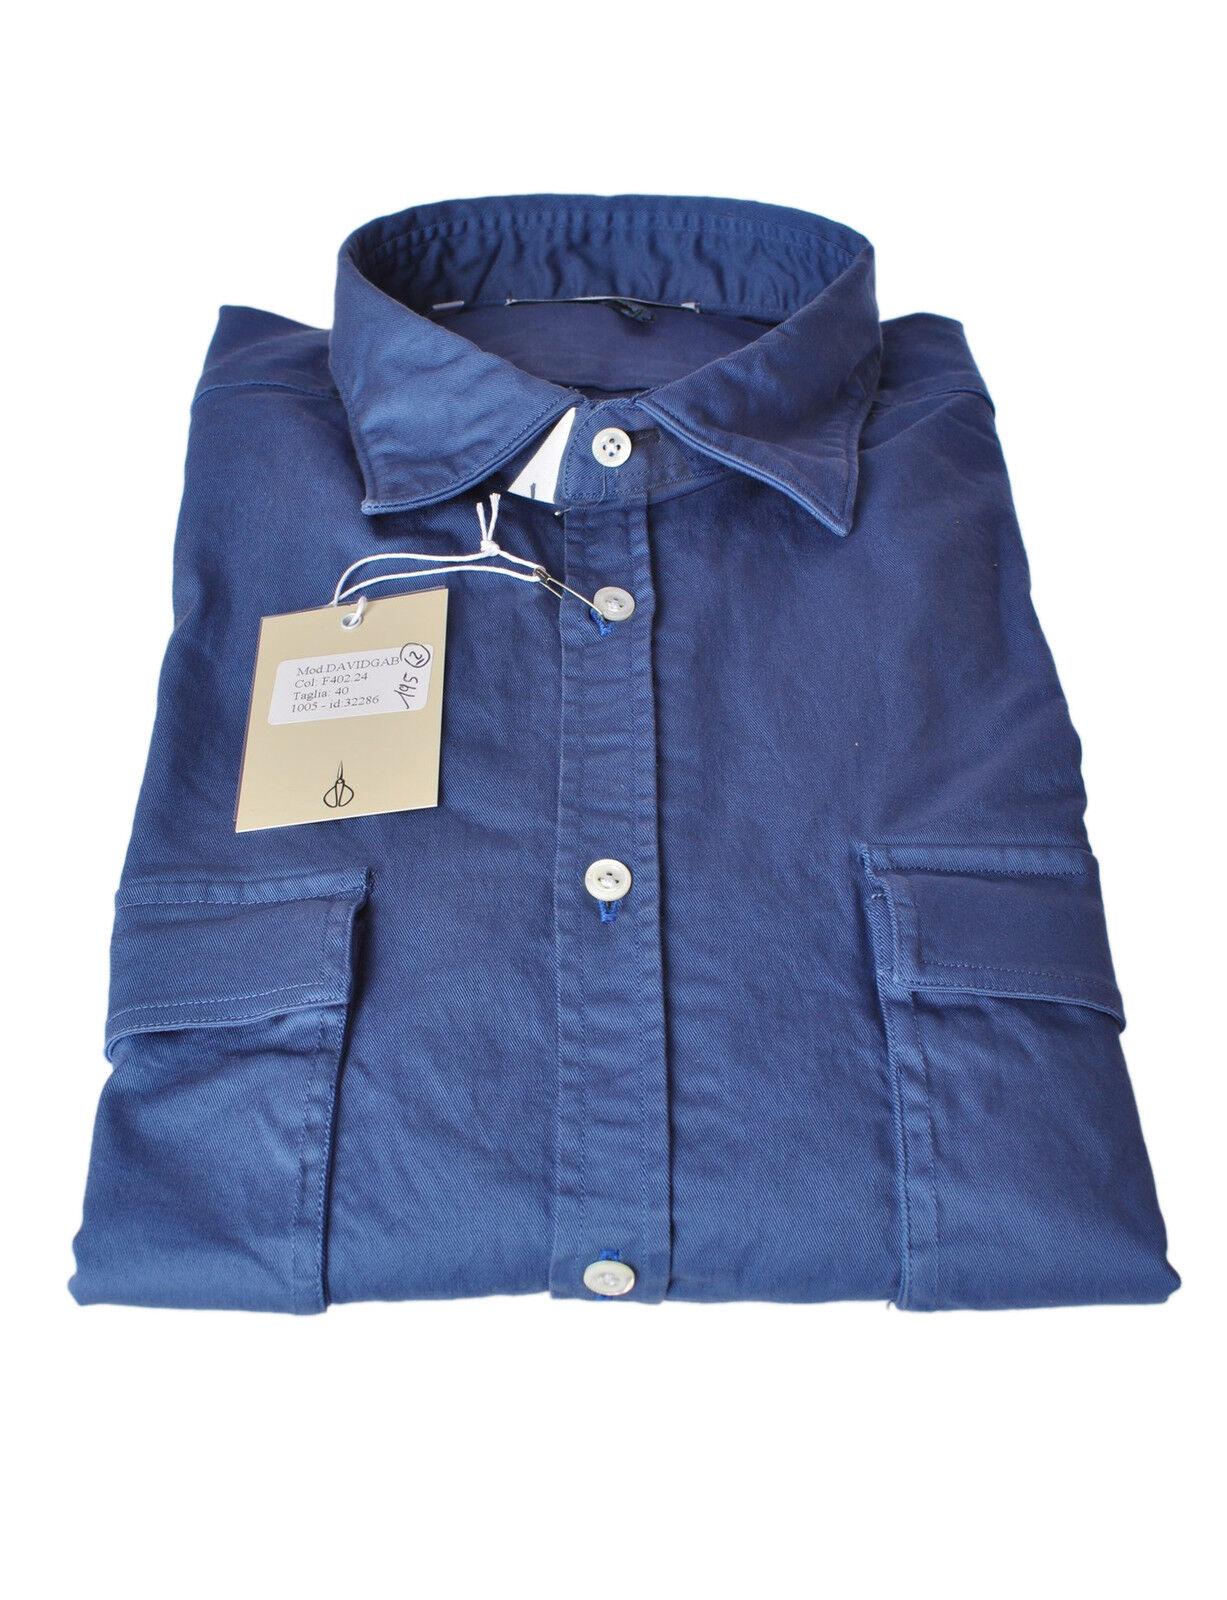 Aglini  -  Camisas - hombre - Azul - 258927A184635